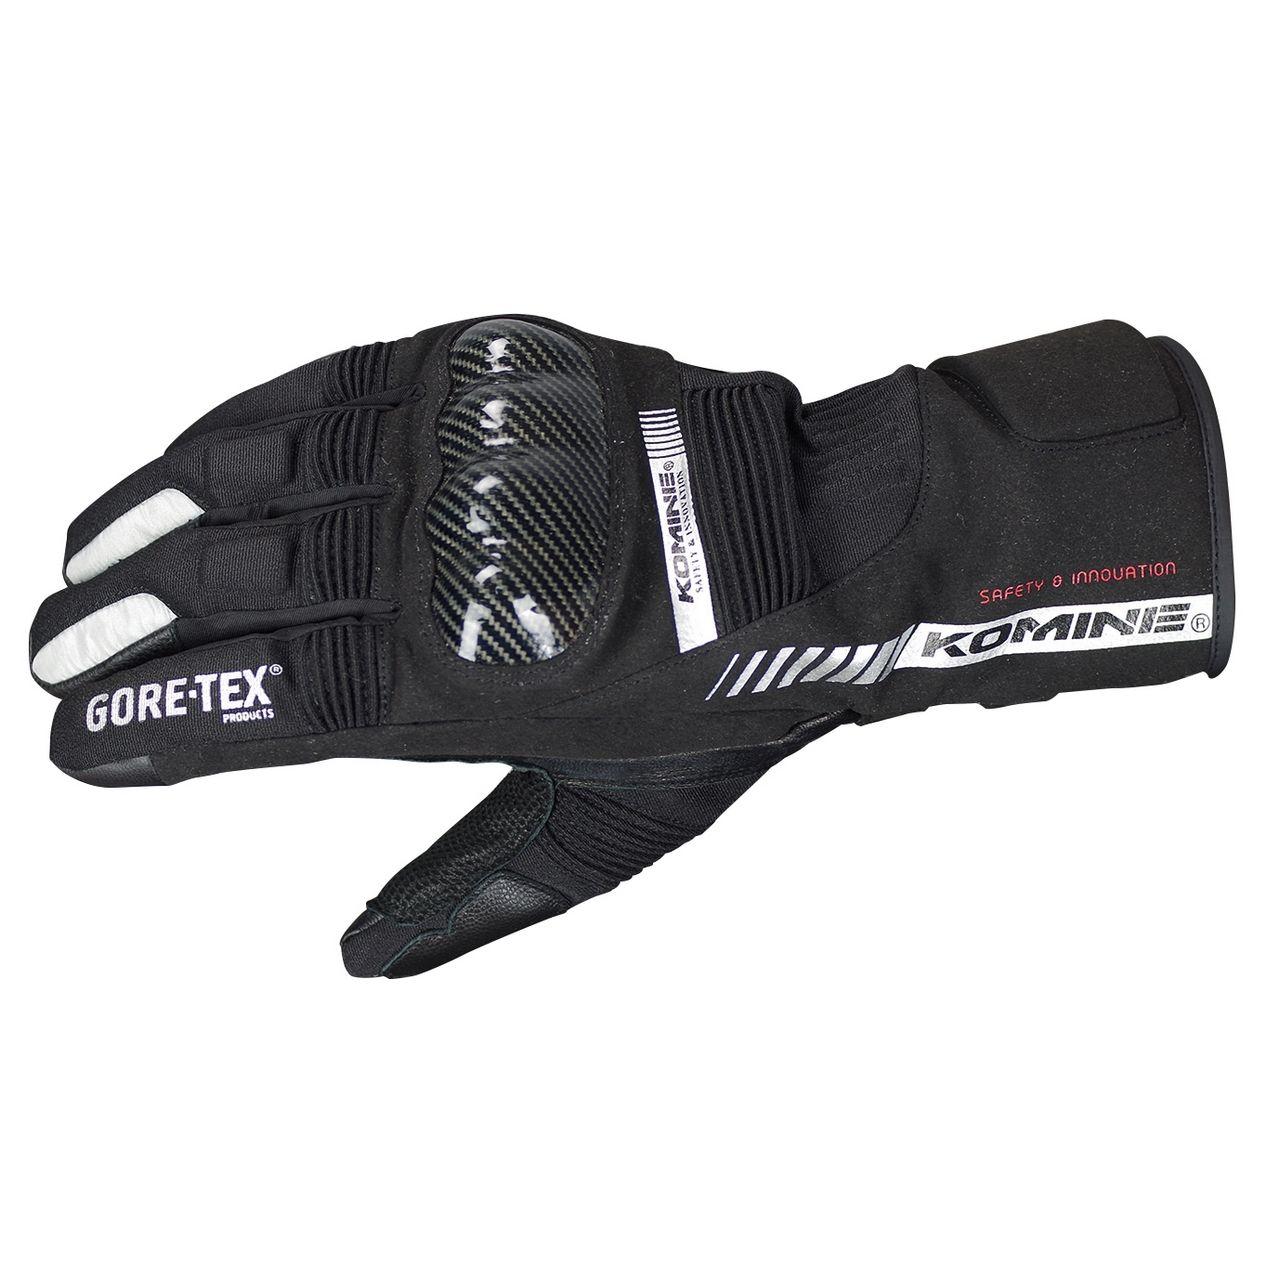 GK-806 GTX Protect Winter Gloves Gaius KOMINE